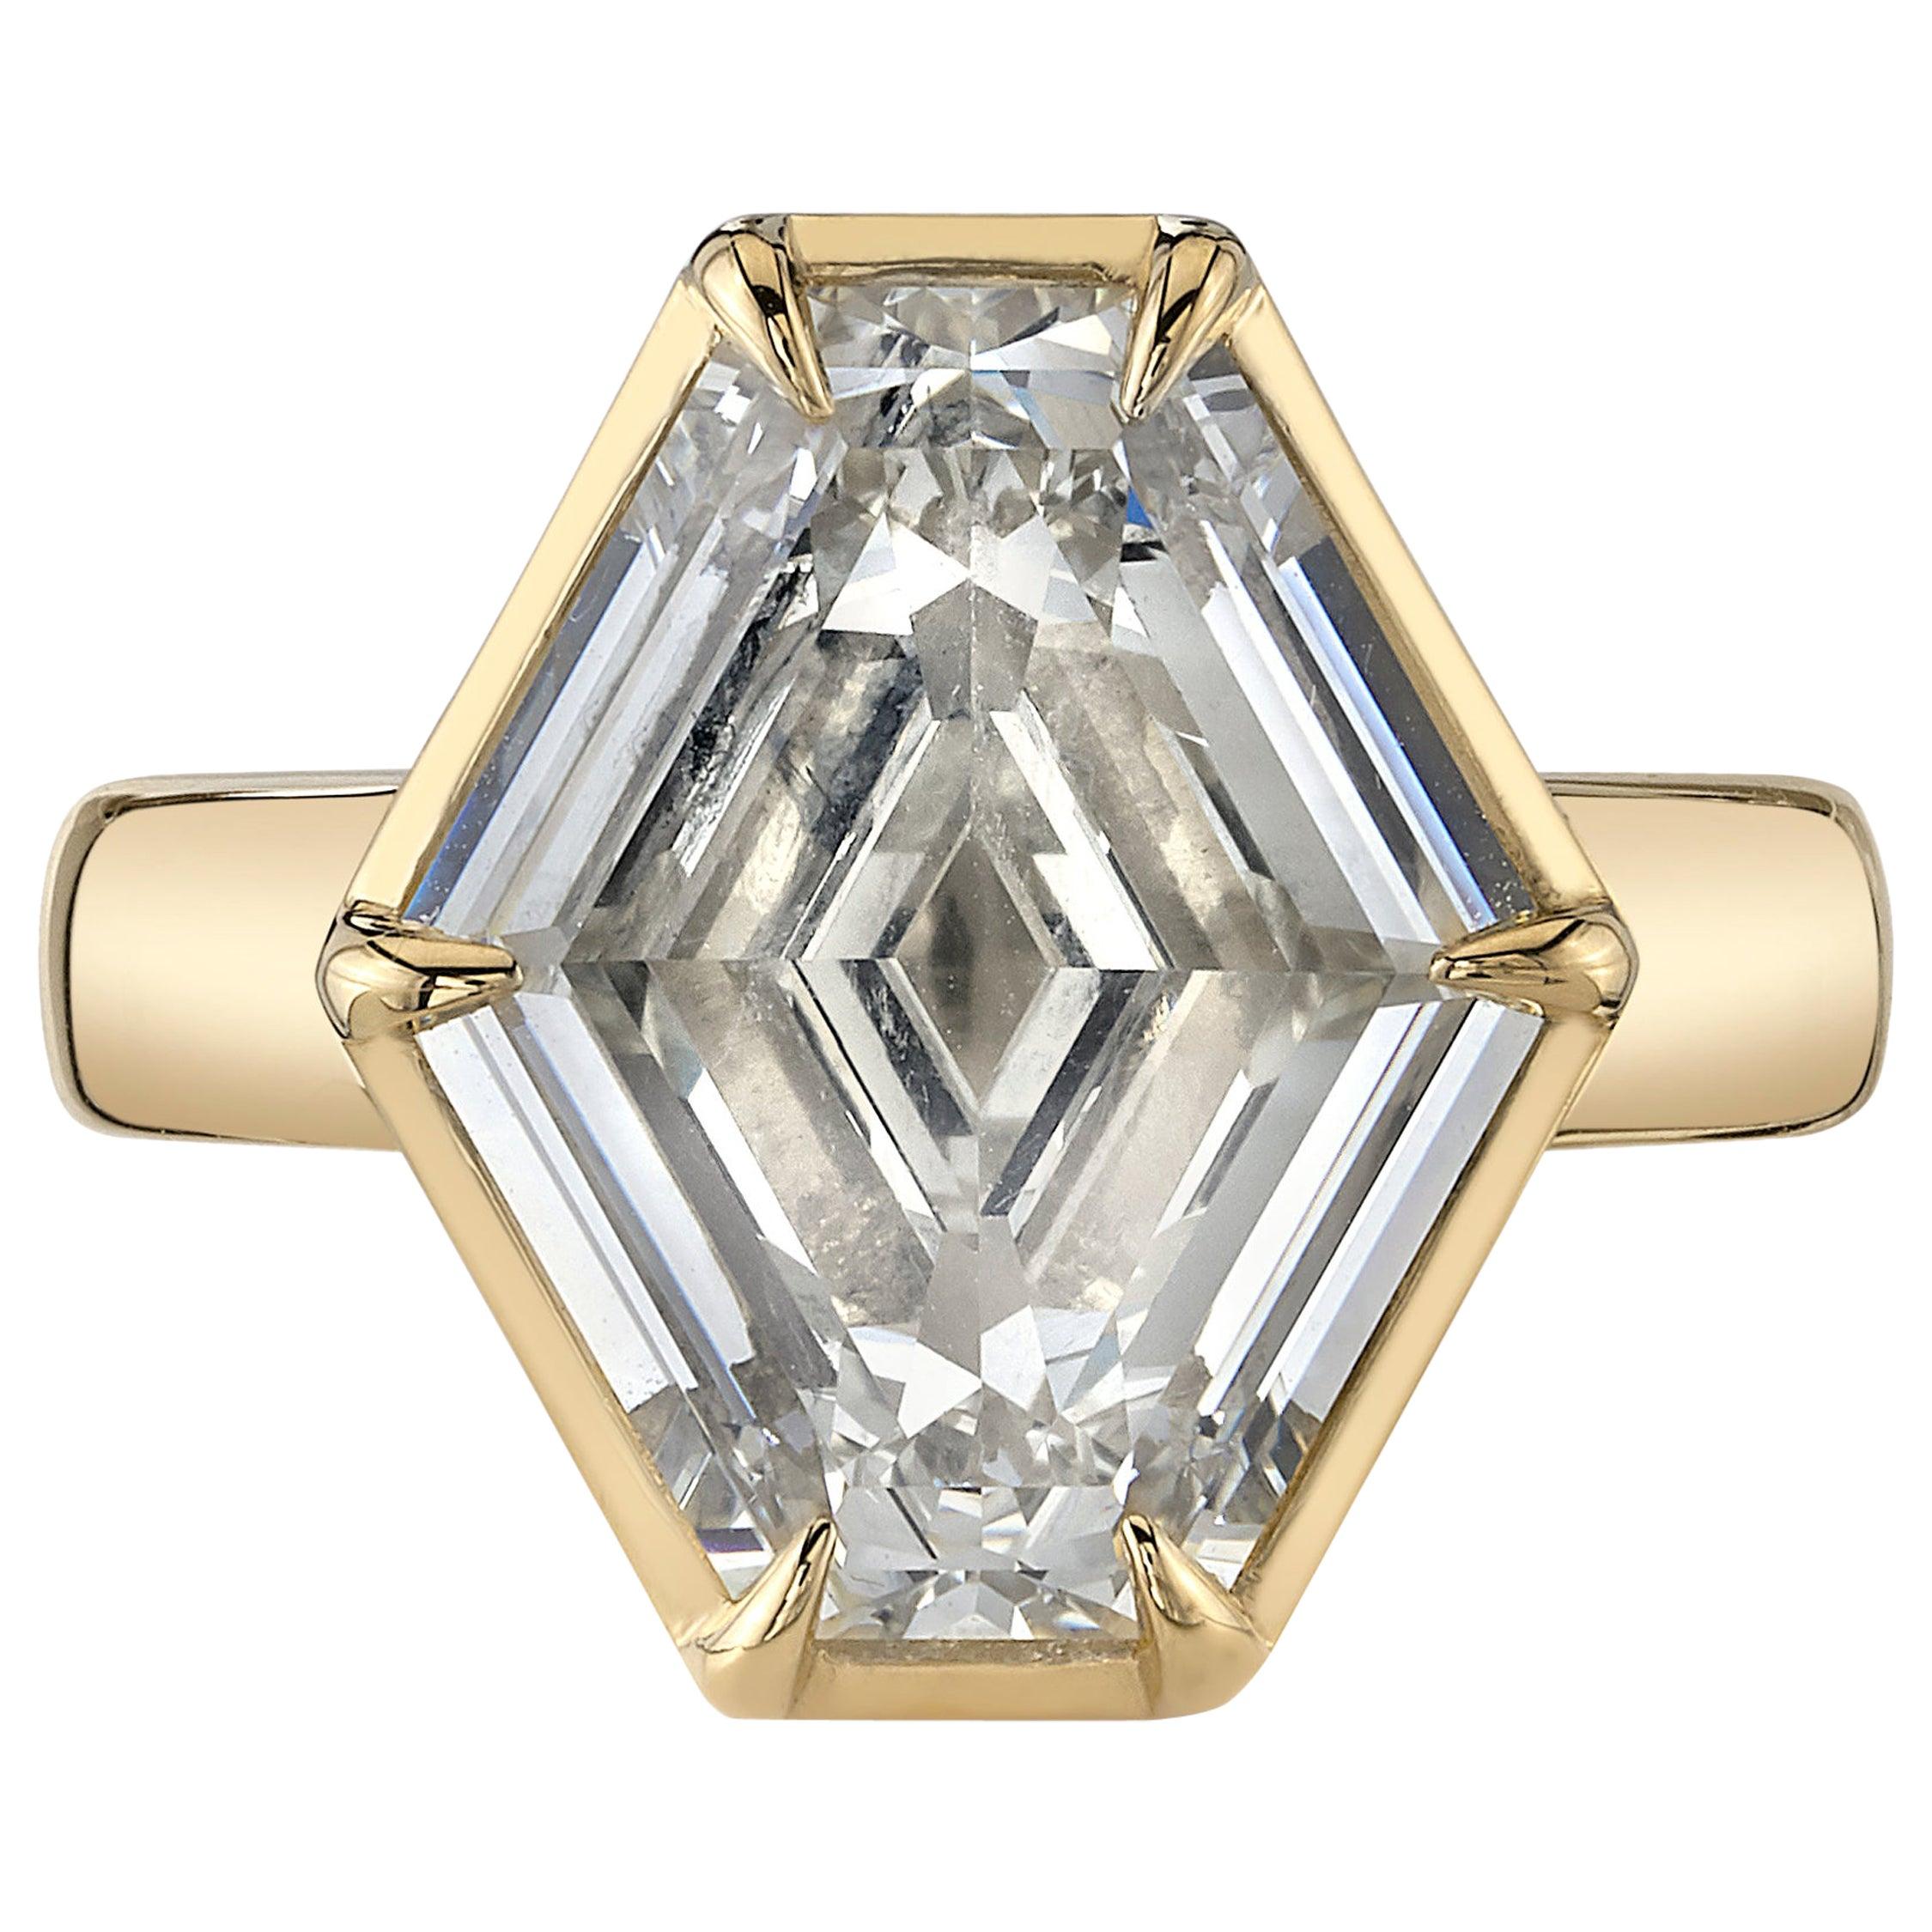 6.02 Carat GIA Certified Hexagonal Cut Diamond Set in an 18 Karat Gold Ring